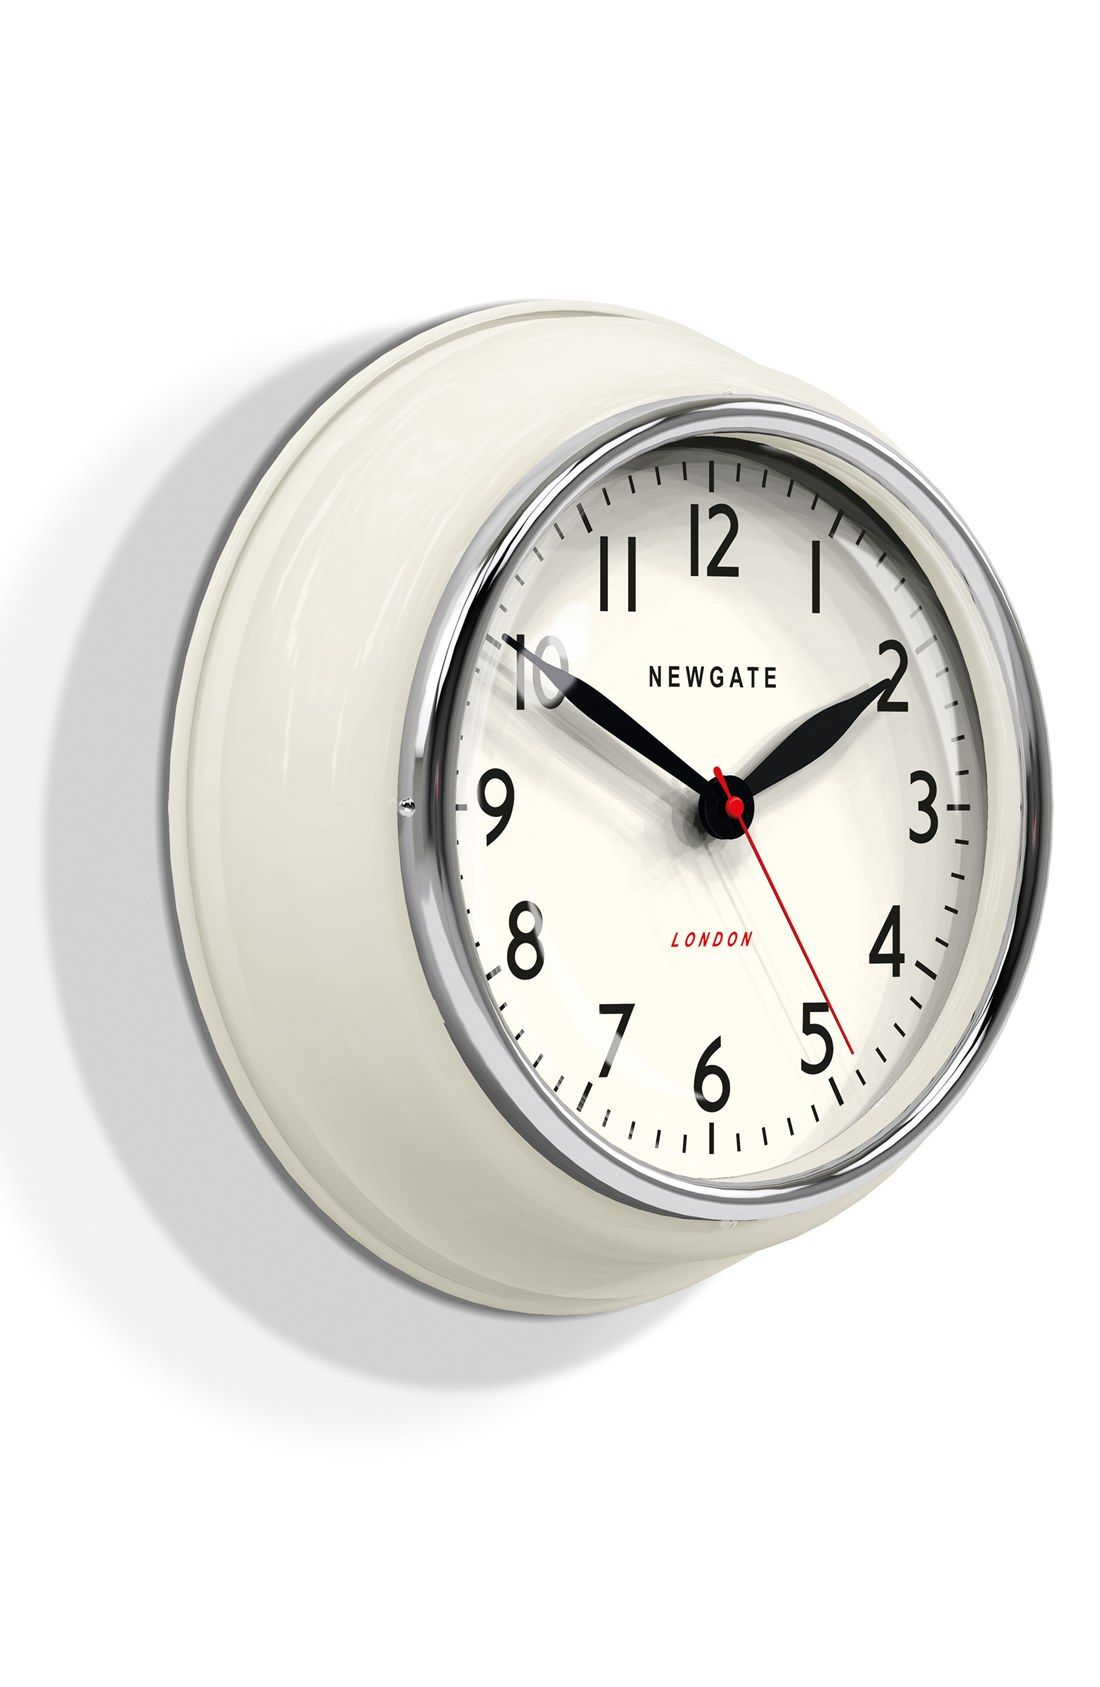 Newgate Cookhouse Wall Clock